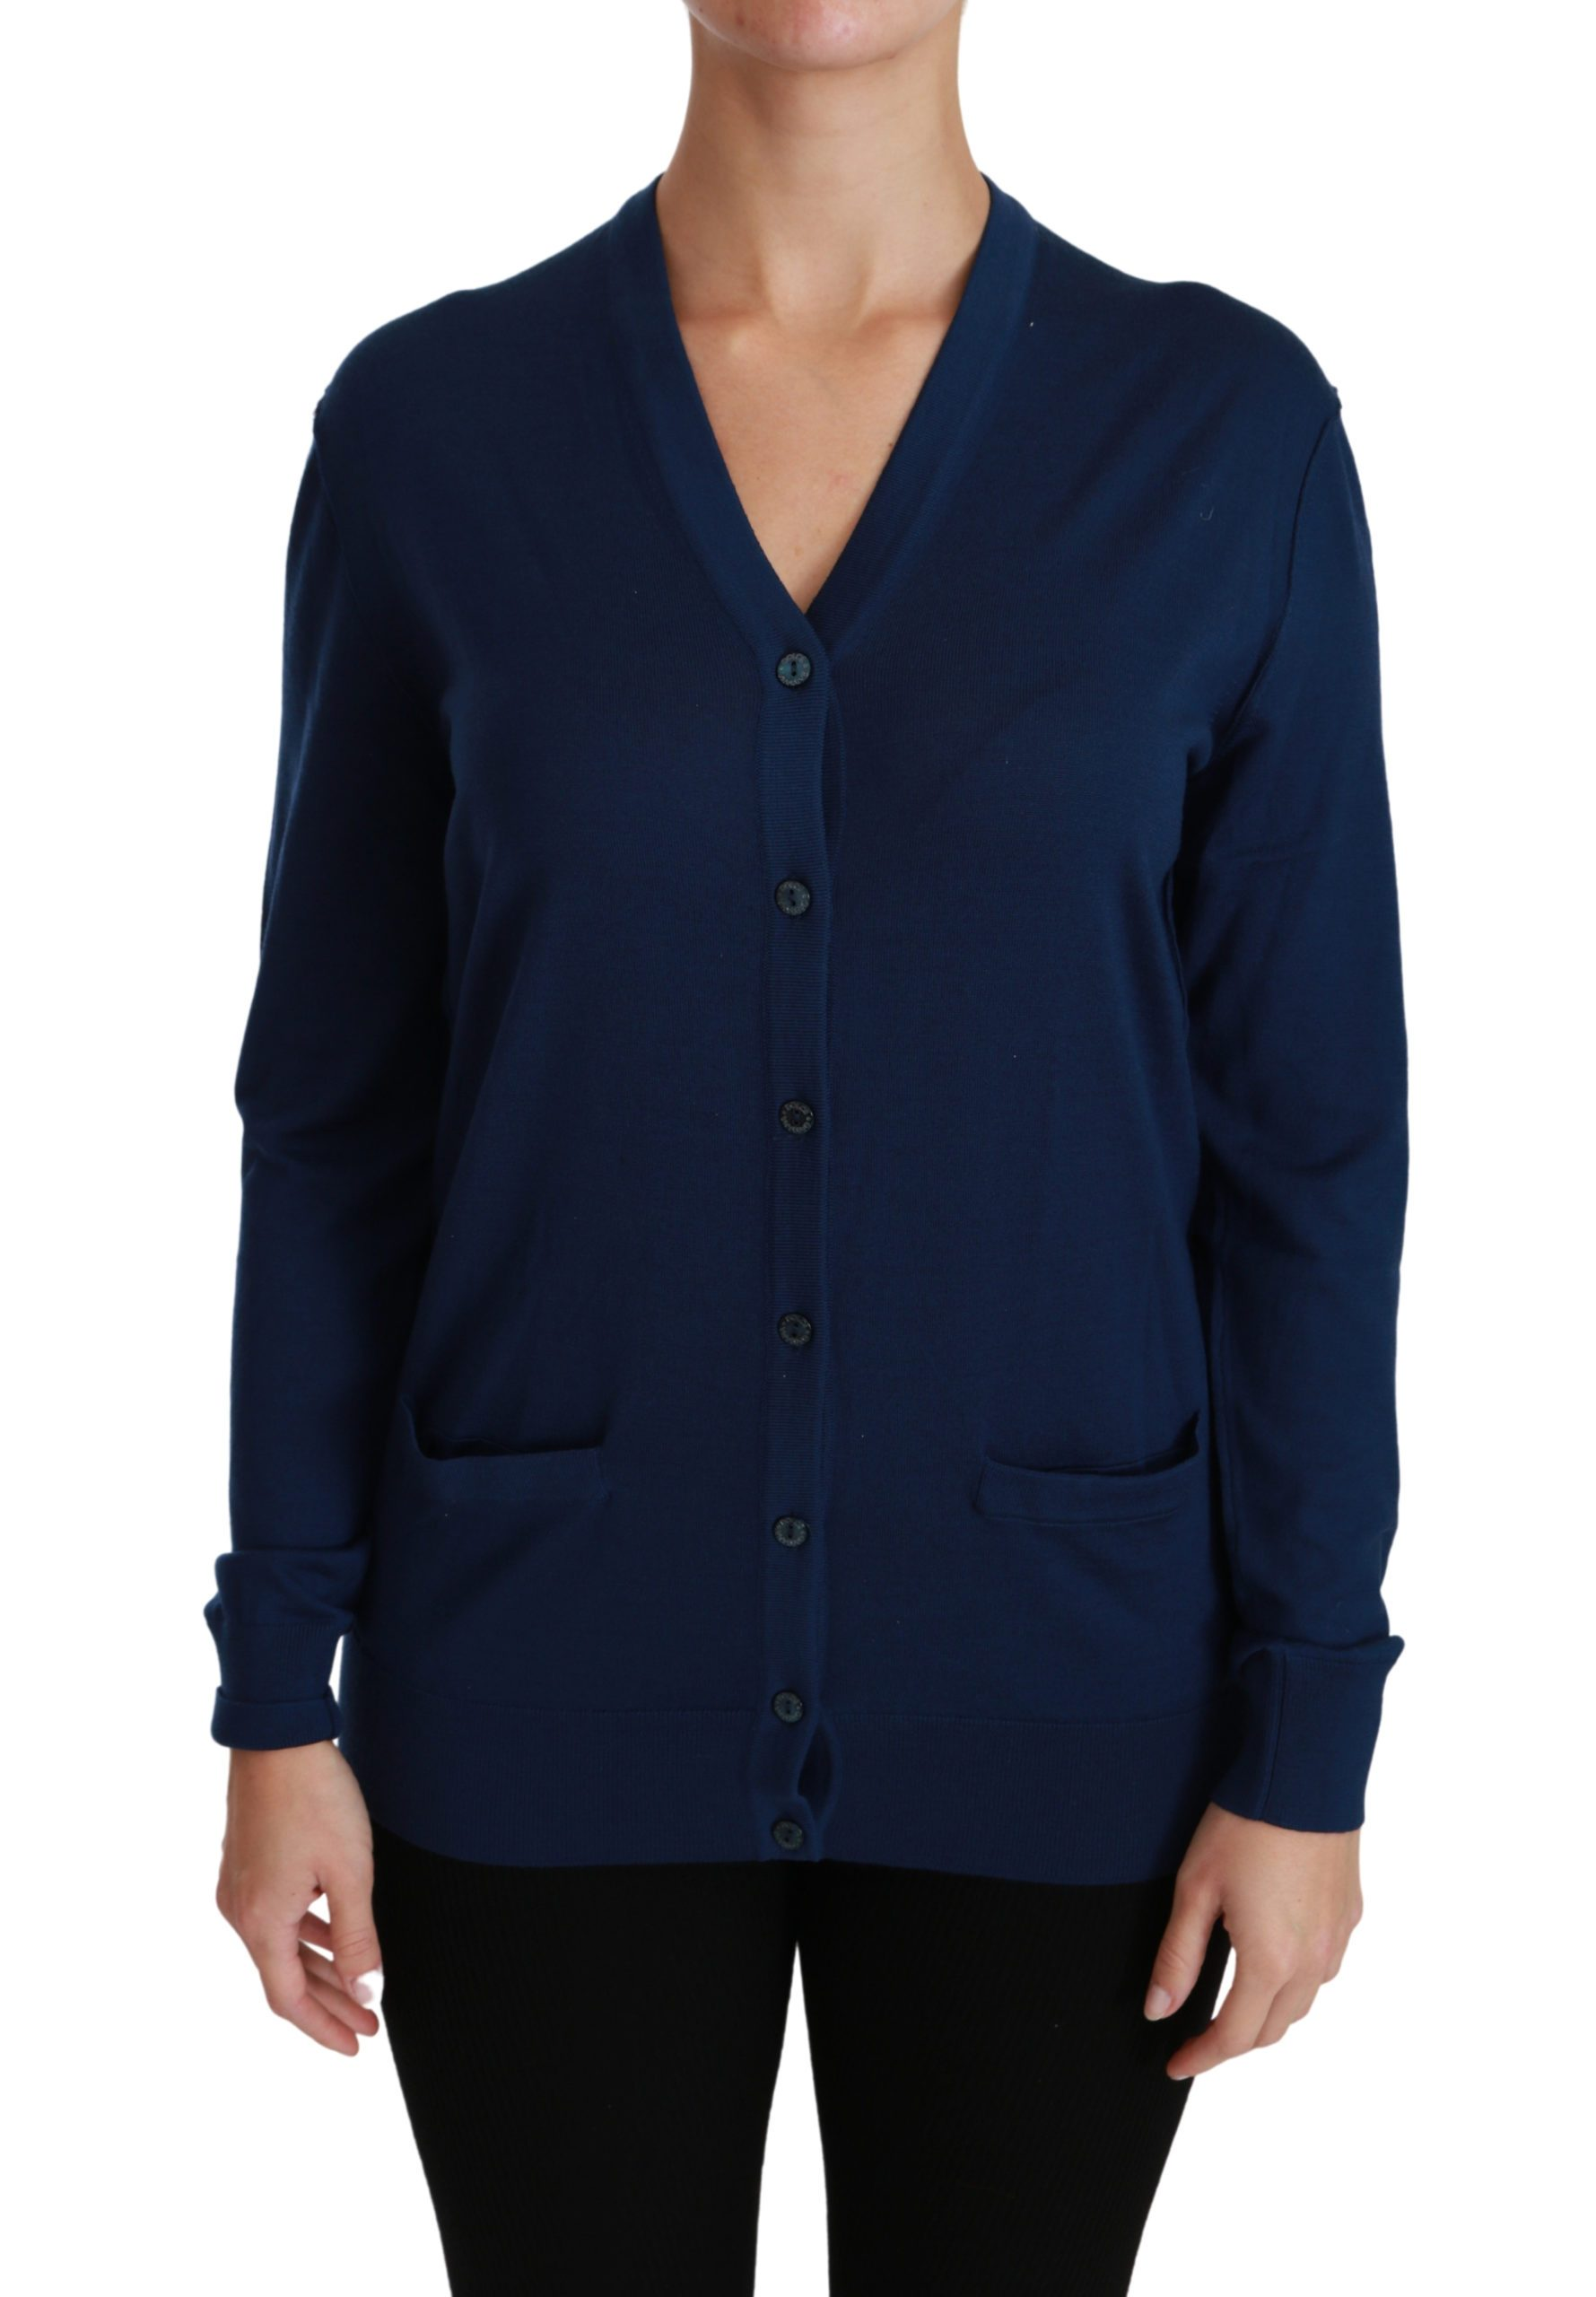 Dolce & Gabbana Women's Button Virgin Wool Cardigan Blue TSH4441 - IT36 | XS